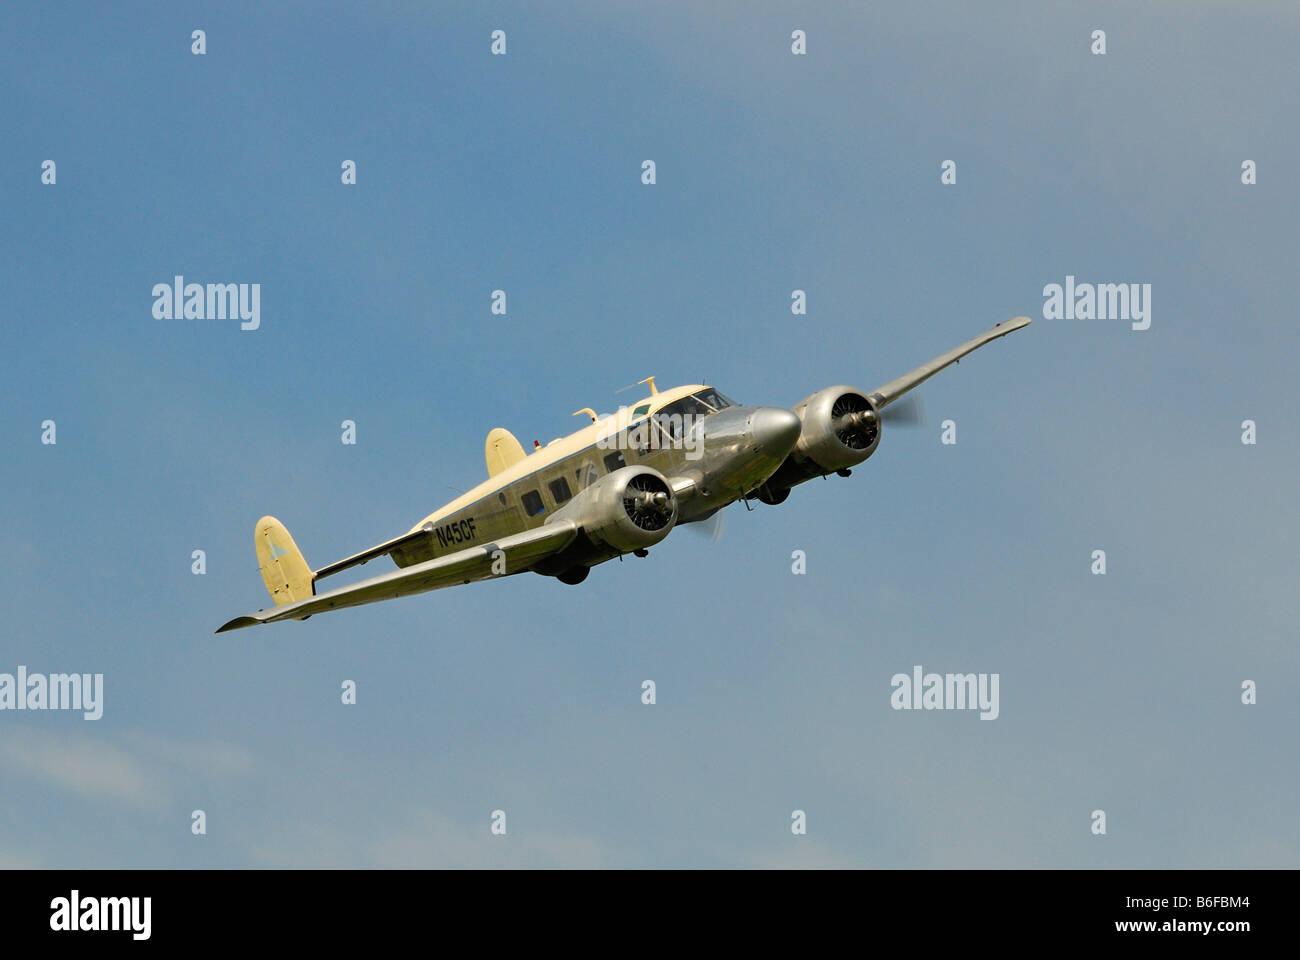 Beechcraft 18 Twin Beech during a deep flyover - Stock Image